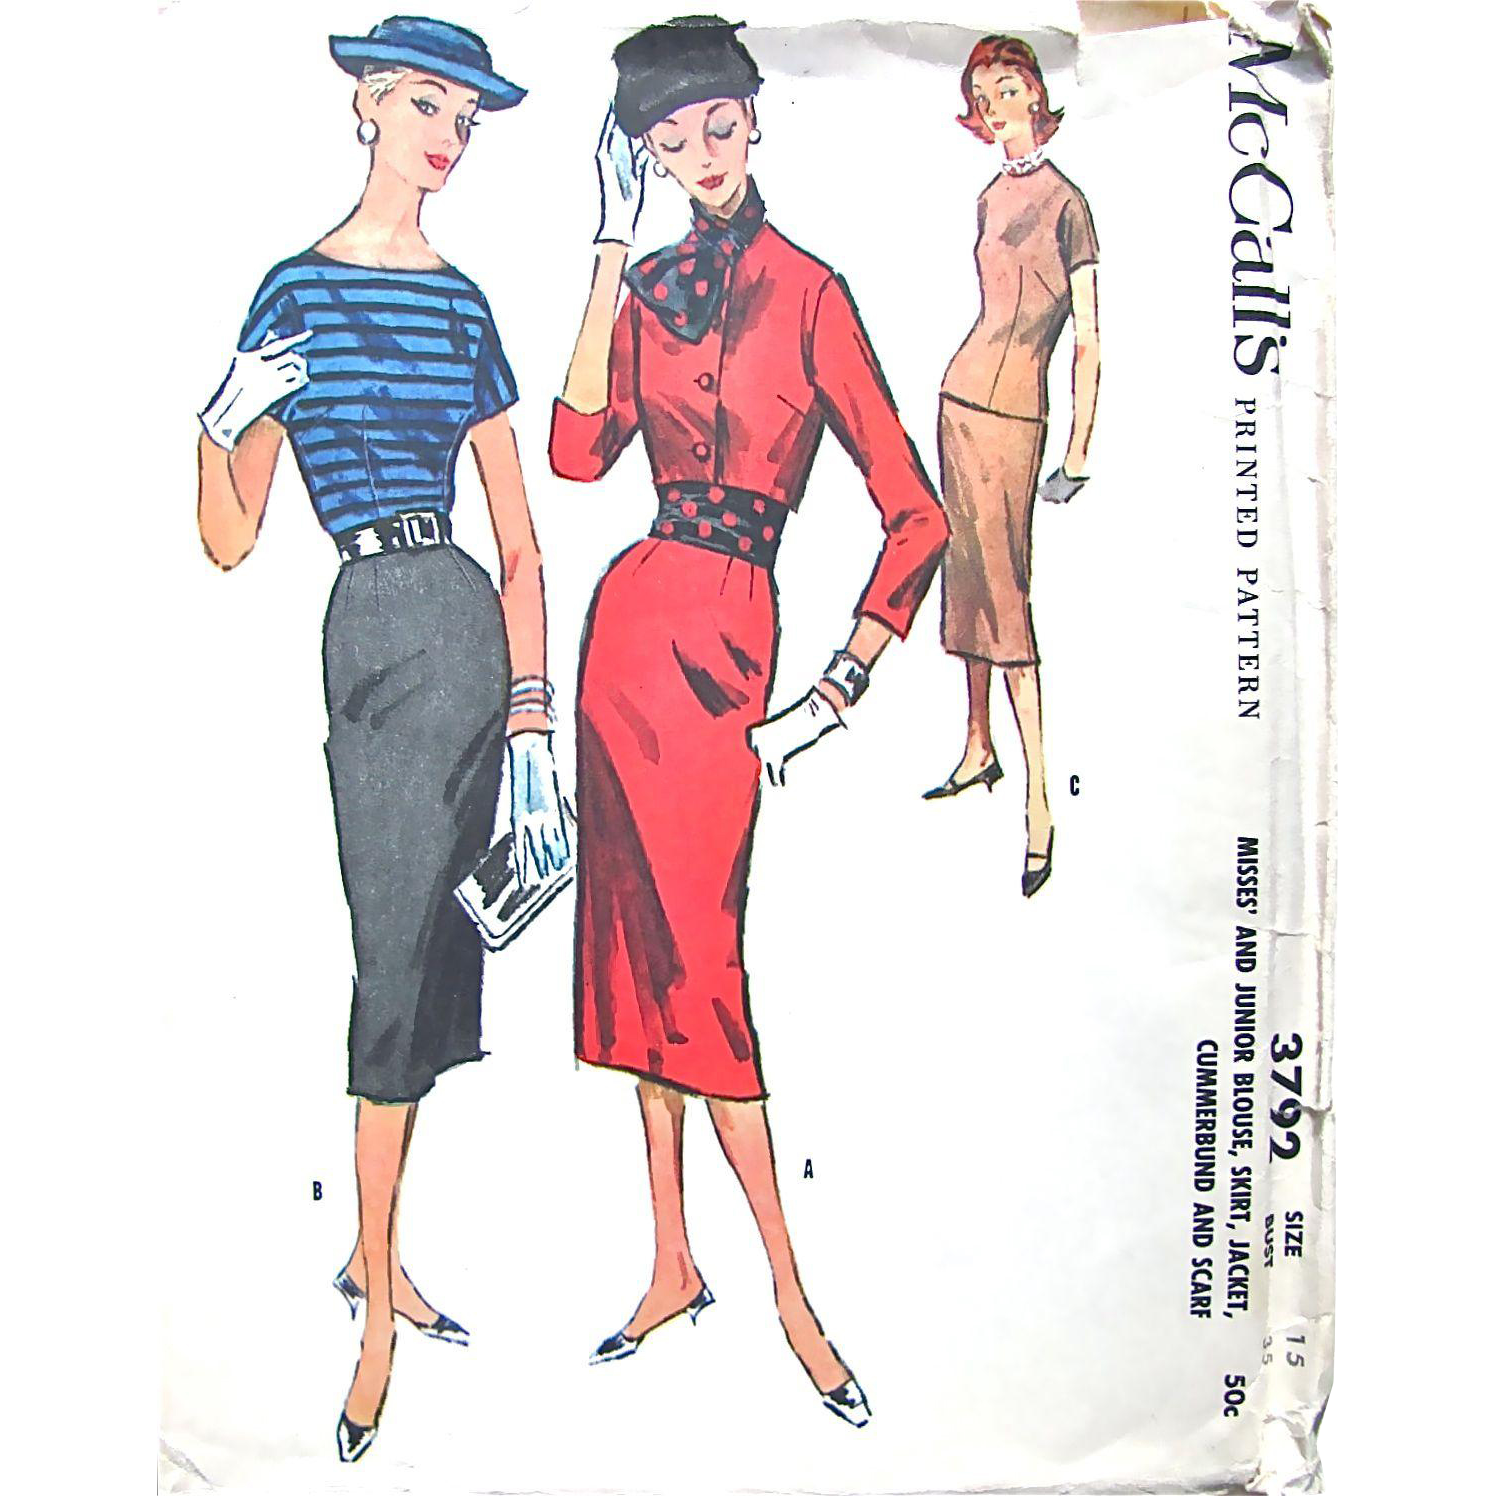 McCall's Pattern 3792, Uncut, Size 15, Pencil Skirt, Jacket, Cummerbund and Scarf, Vintage 1956